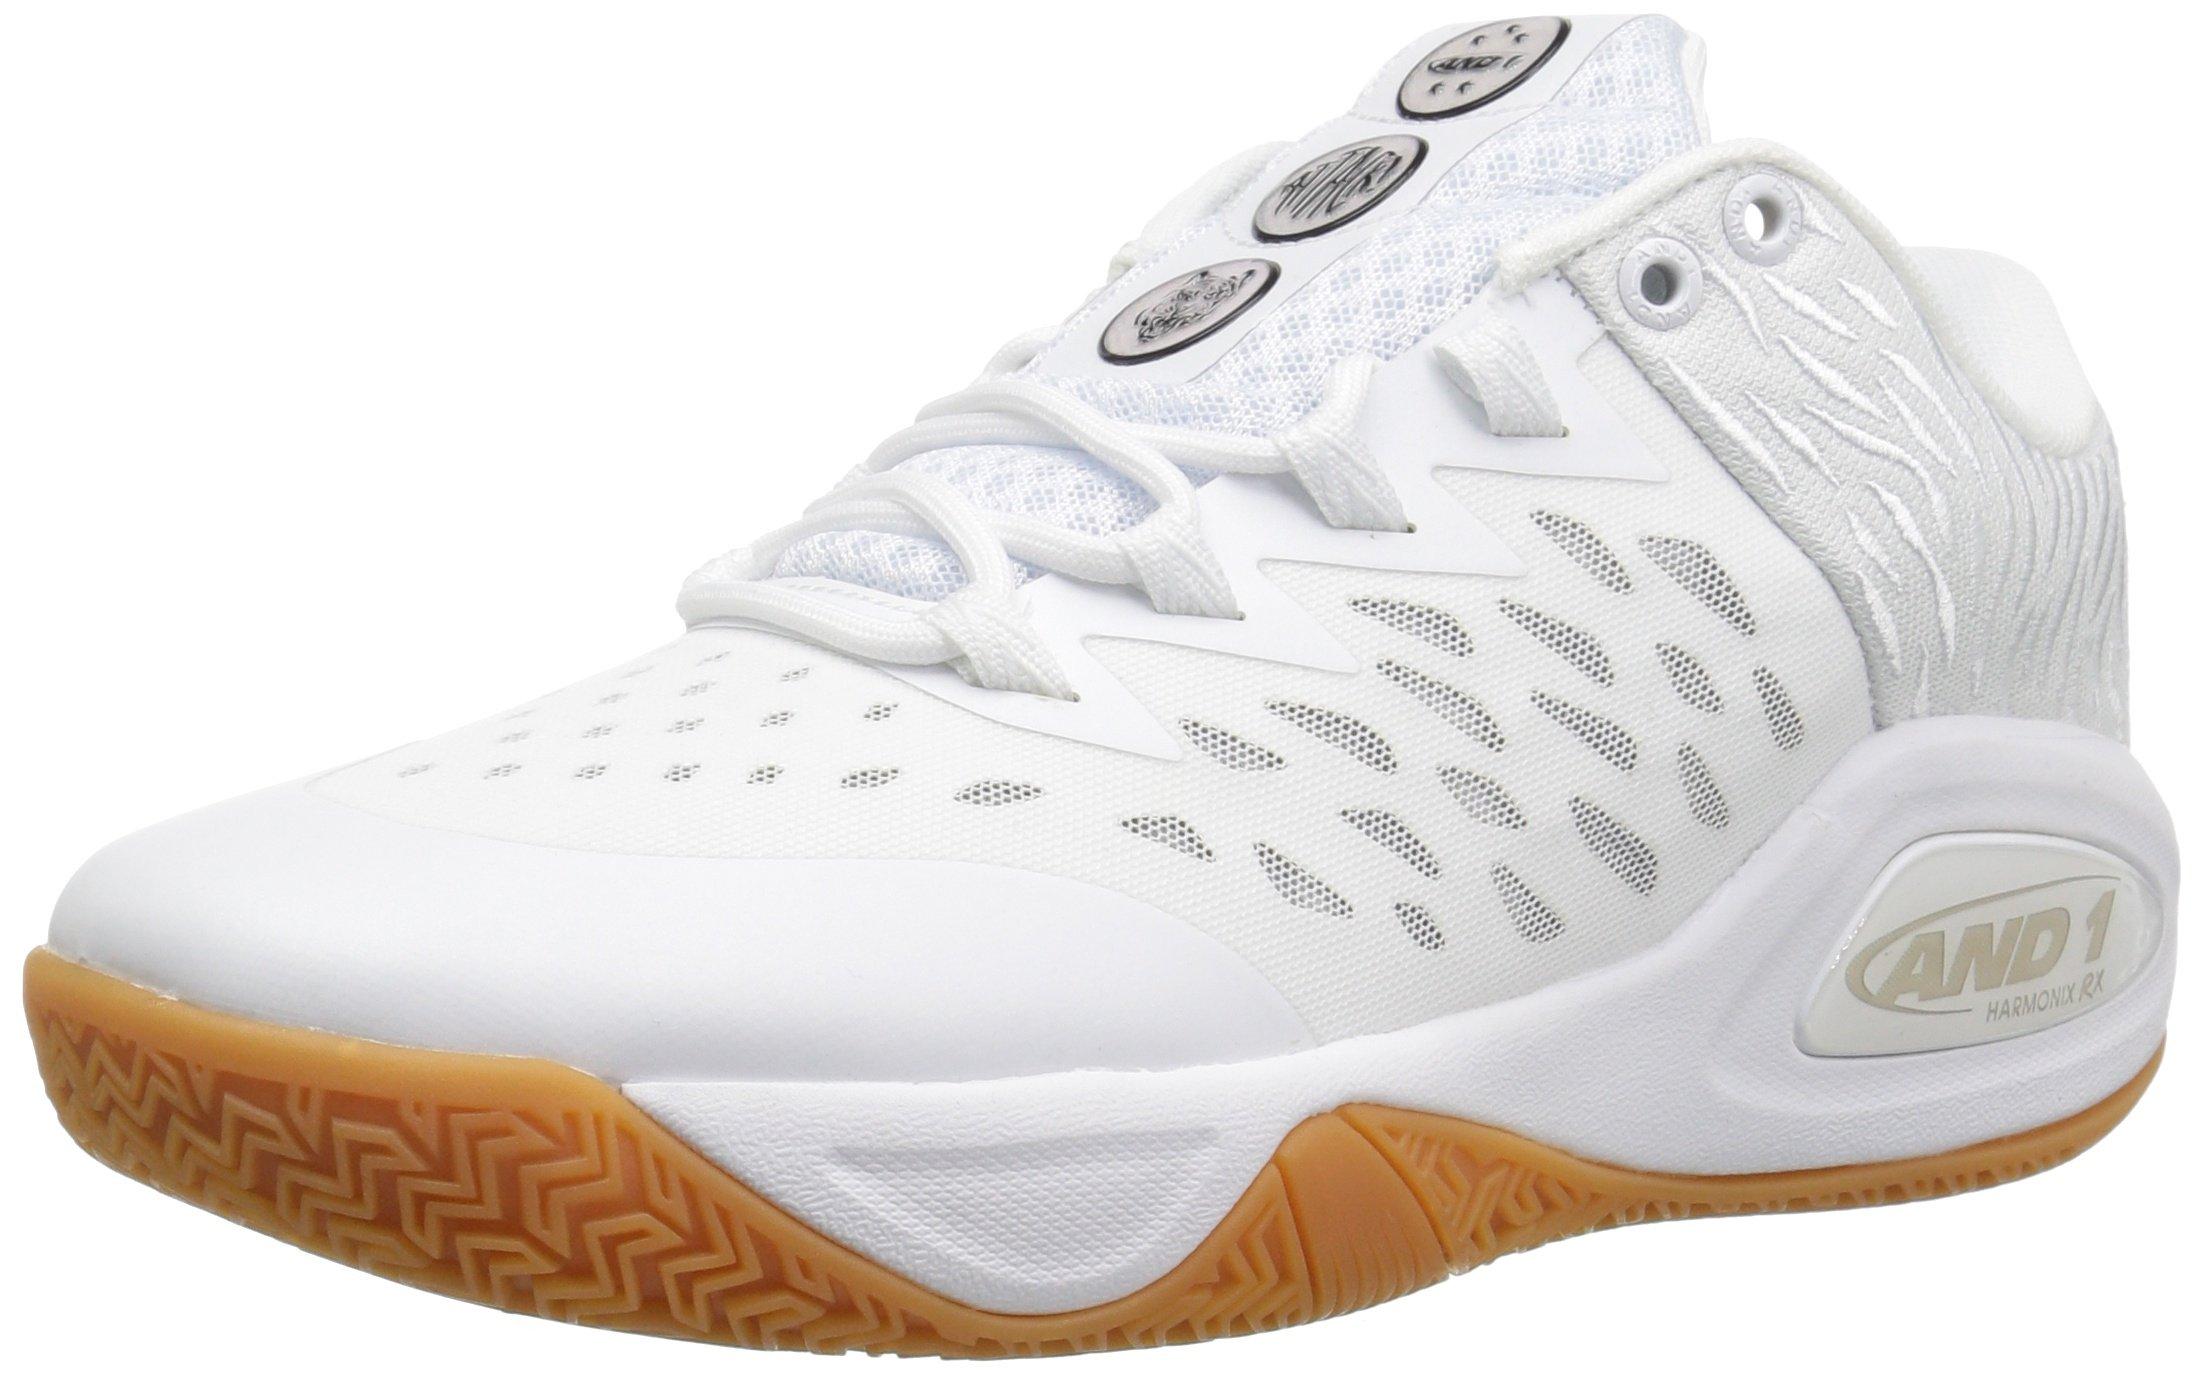 ba1ed2541c500 AND 1 Men's Attack Low Basketball Shoe, White/Super foil/Gum, 7 M US